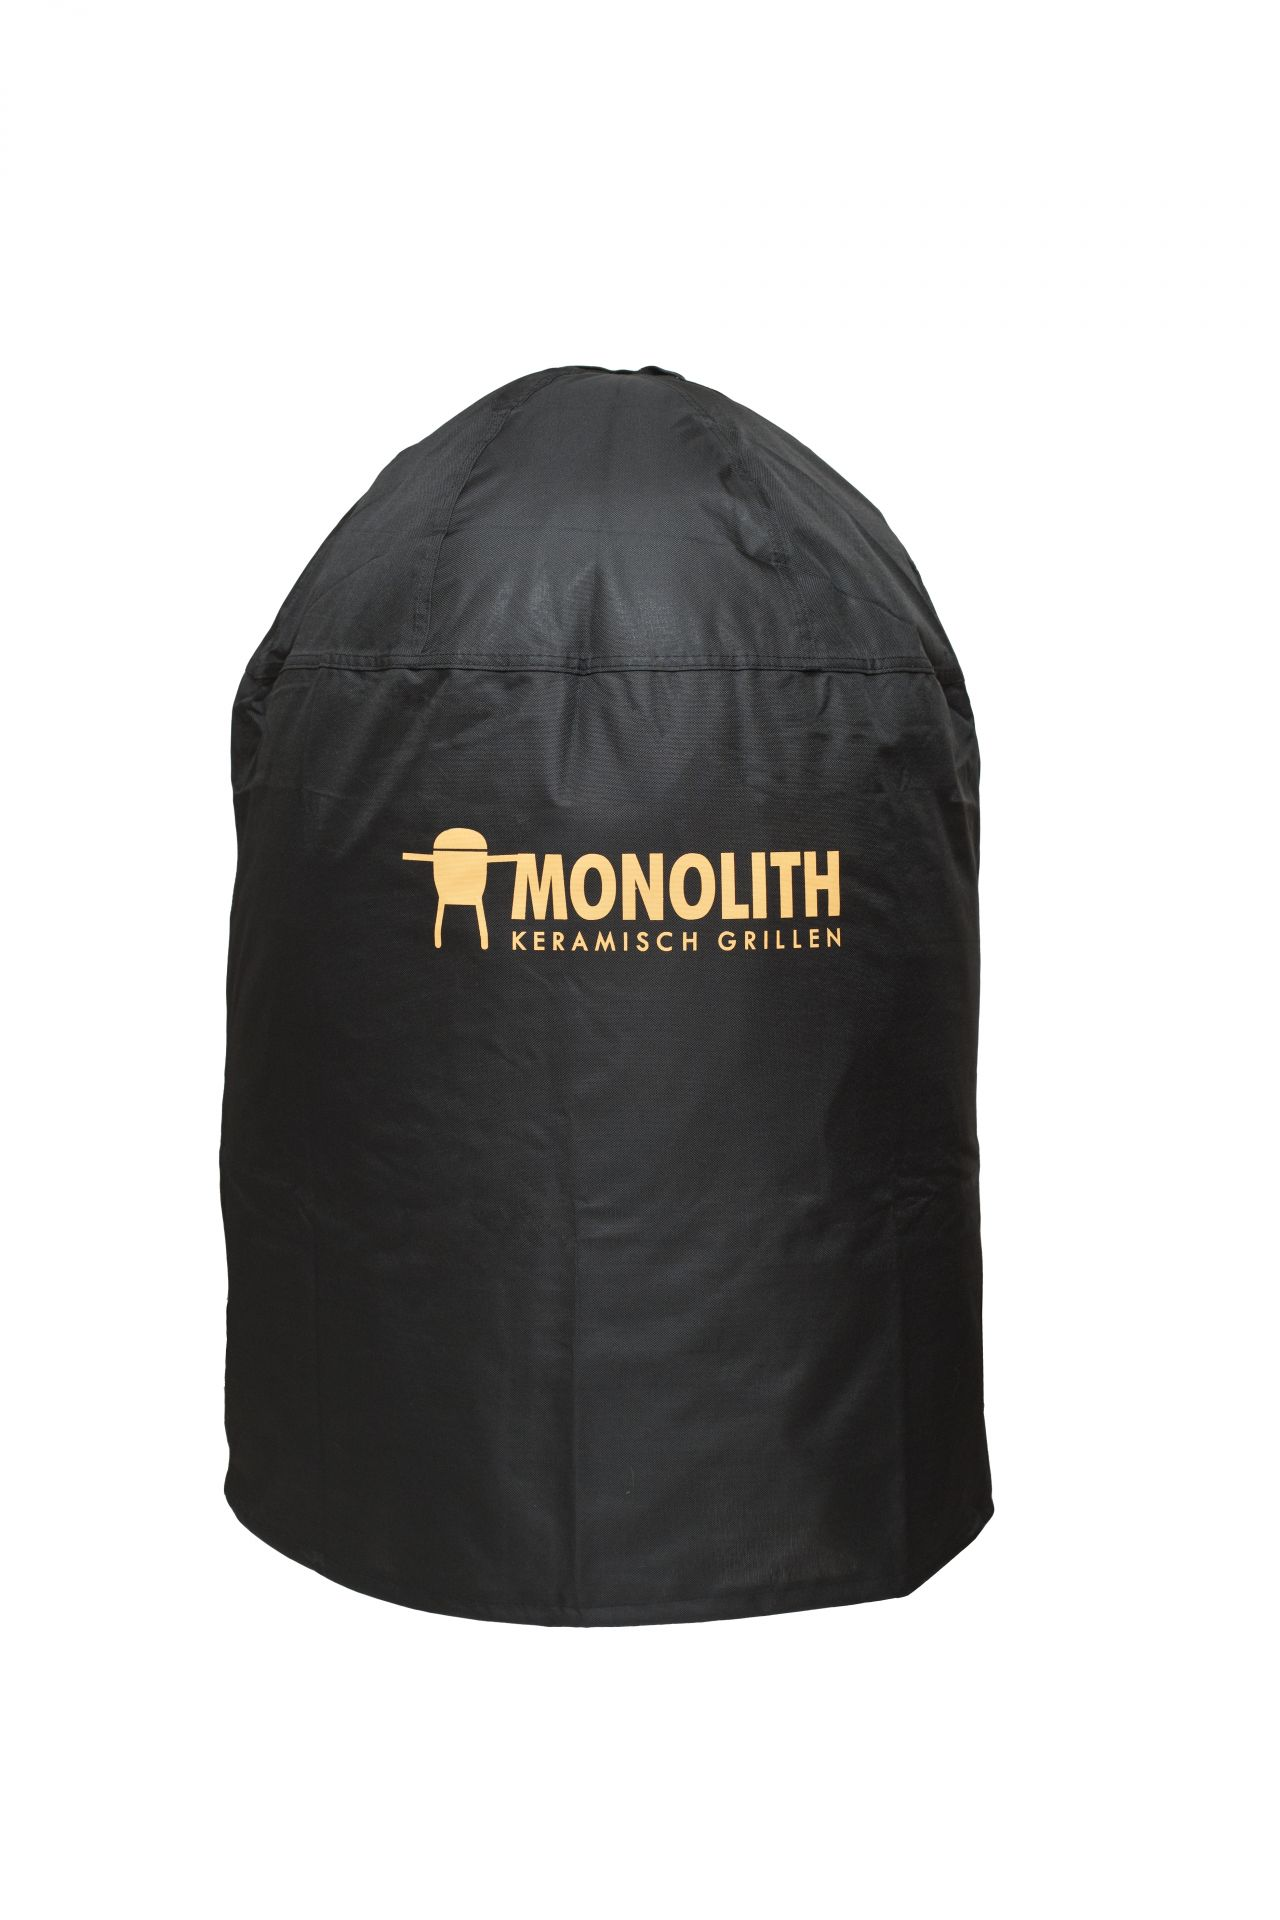 Monolith Classic Abdeckhaube